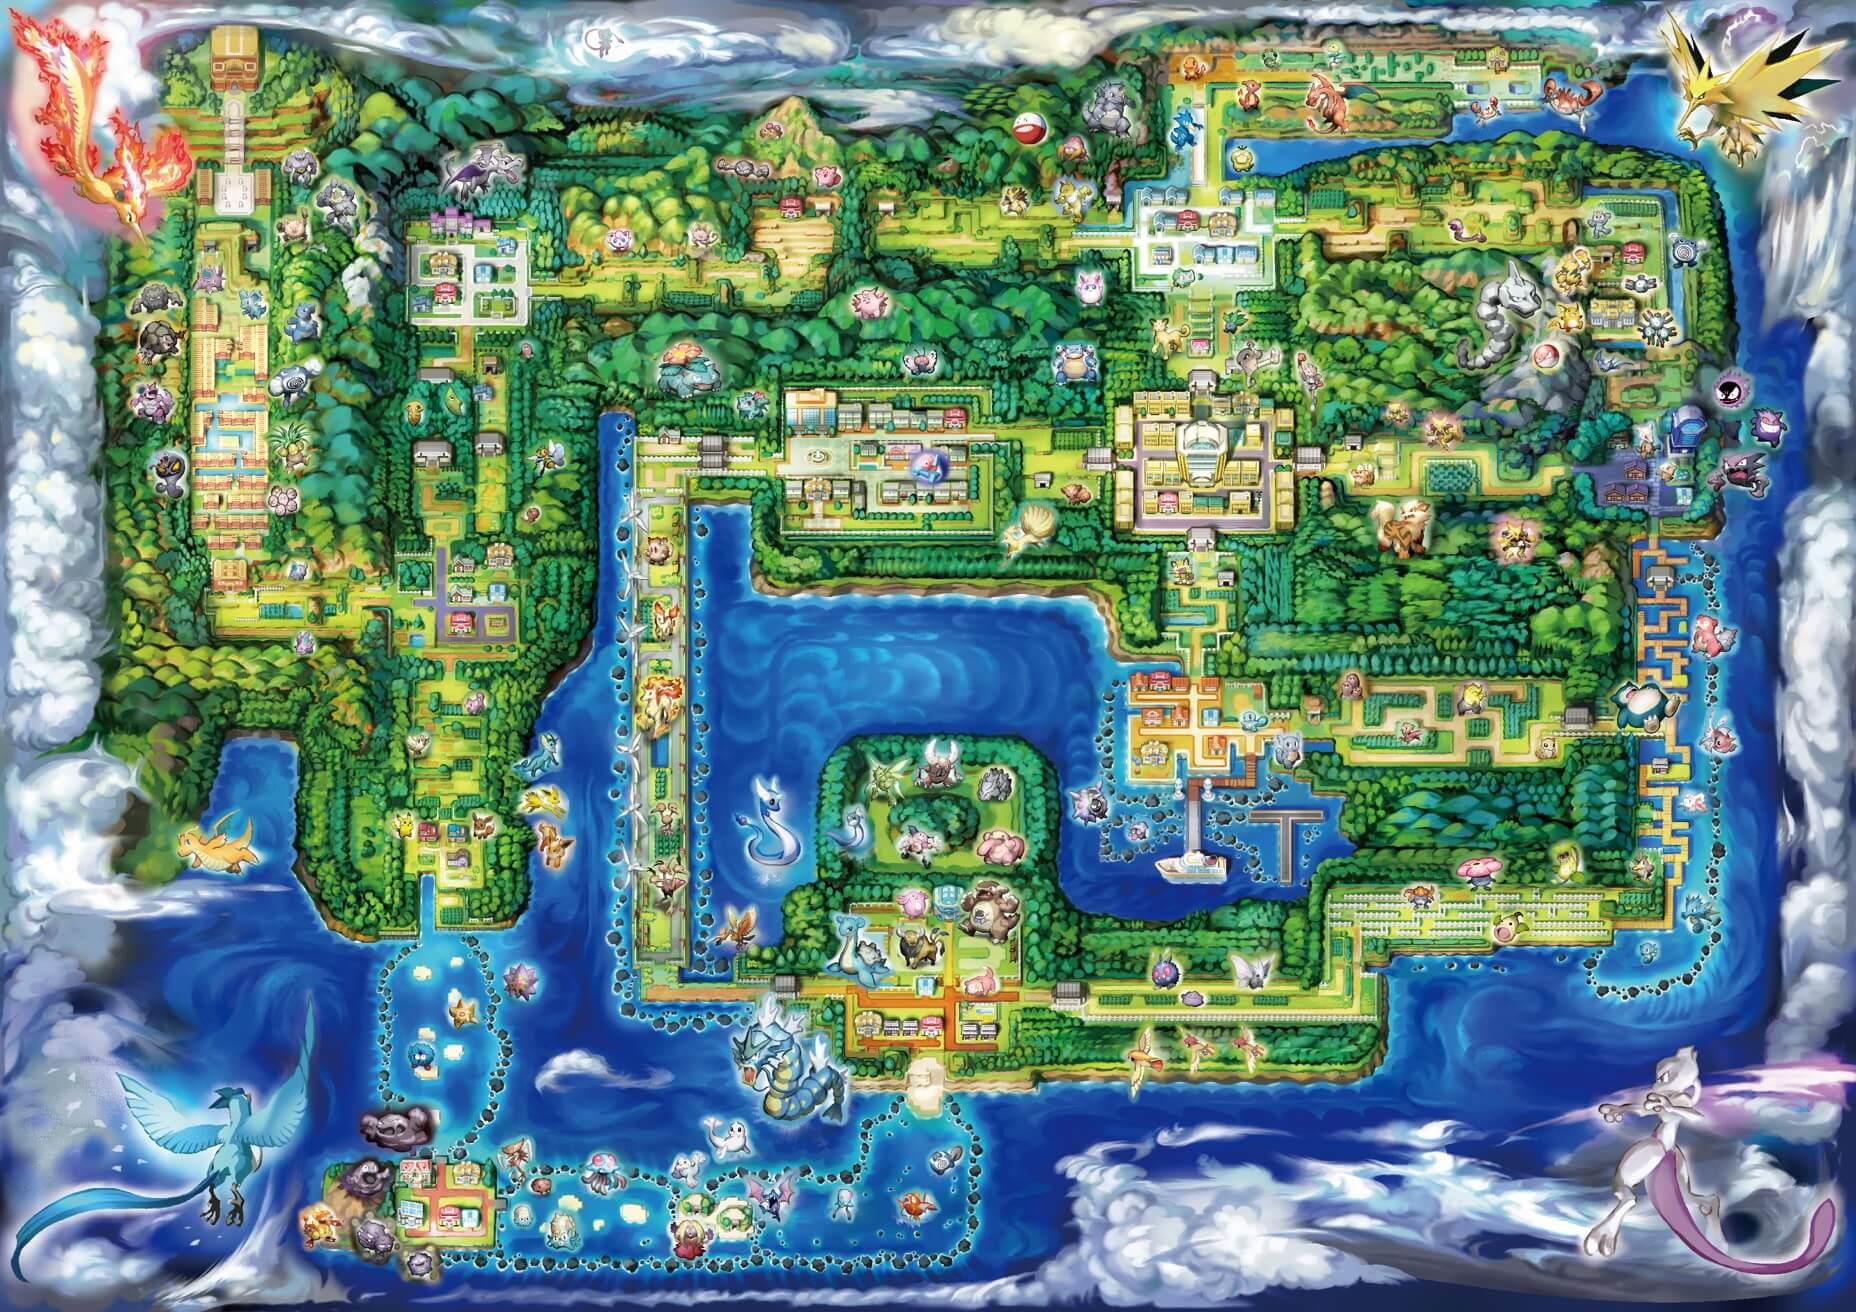 Pokémon: Let's Go, Pikachu/Eevee! |OT| One Step Forward, Six